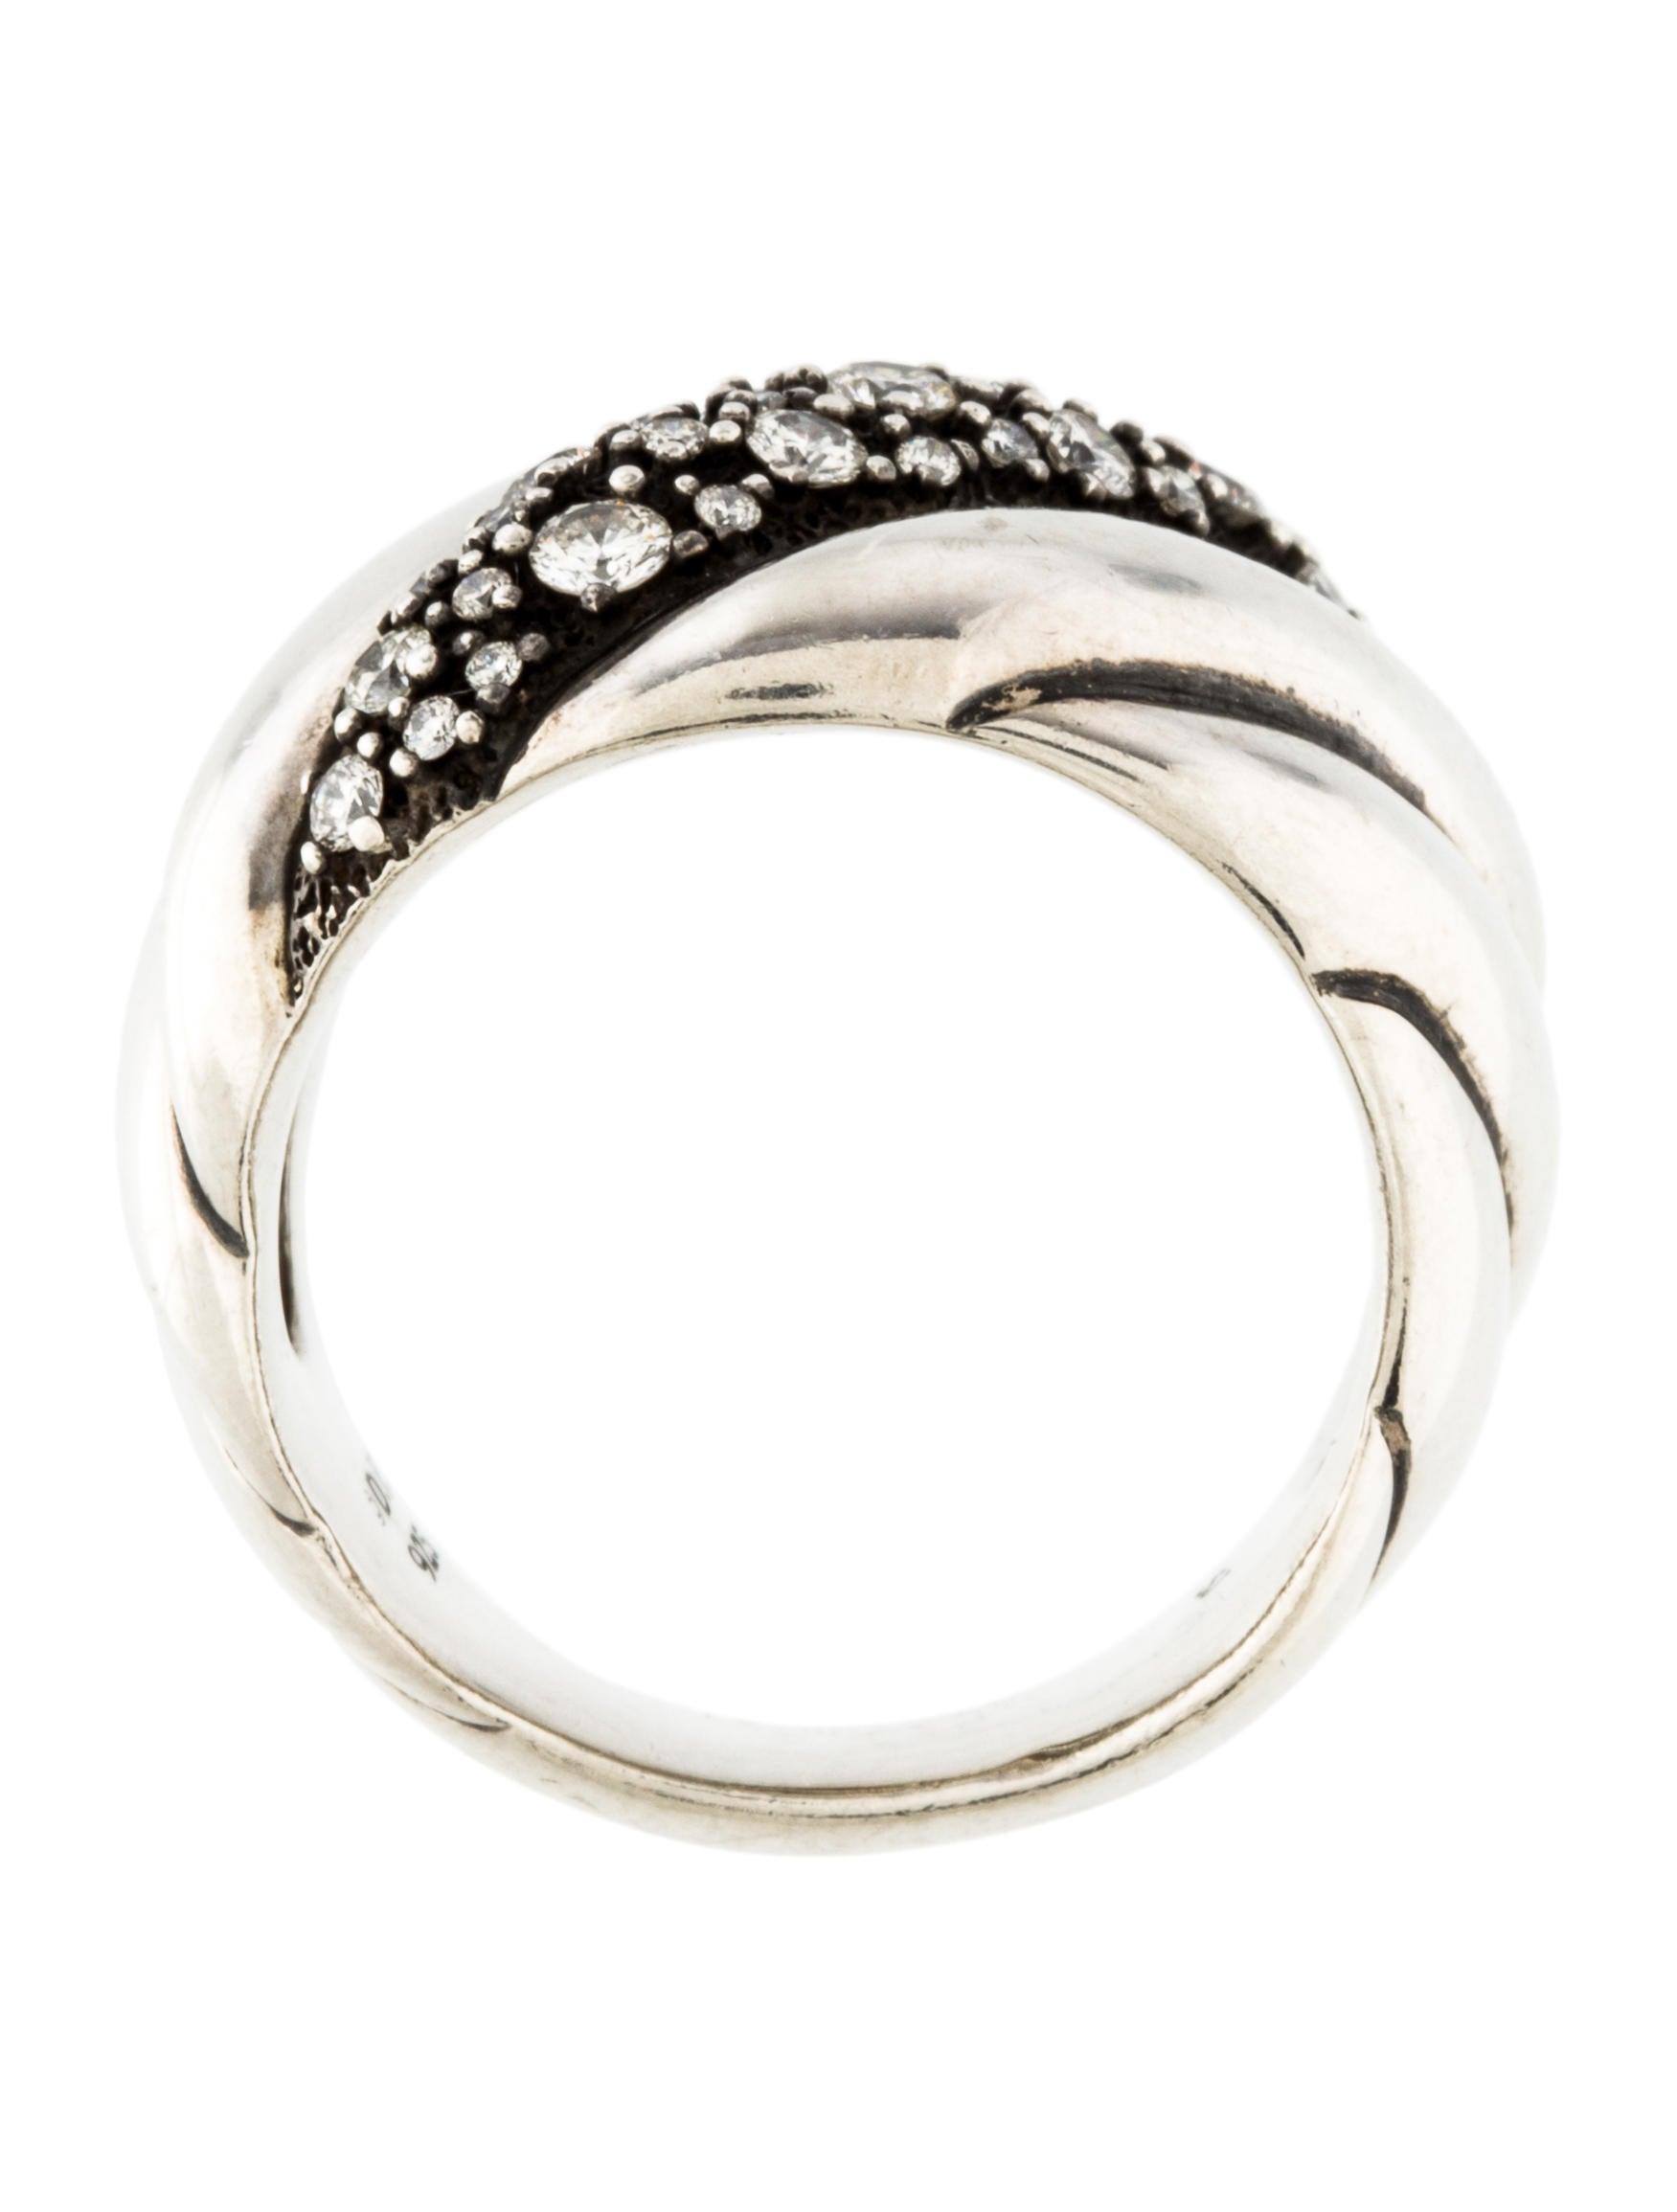 David yurman diamond hampton cable ring rings dvy37666 for David yurman inspired jewelry rings